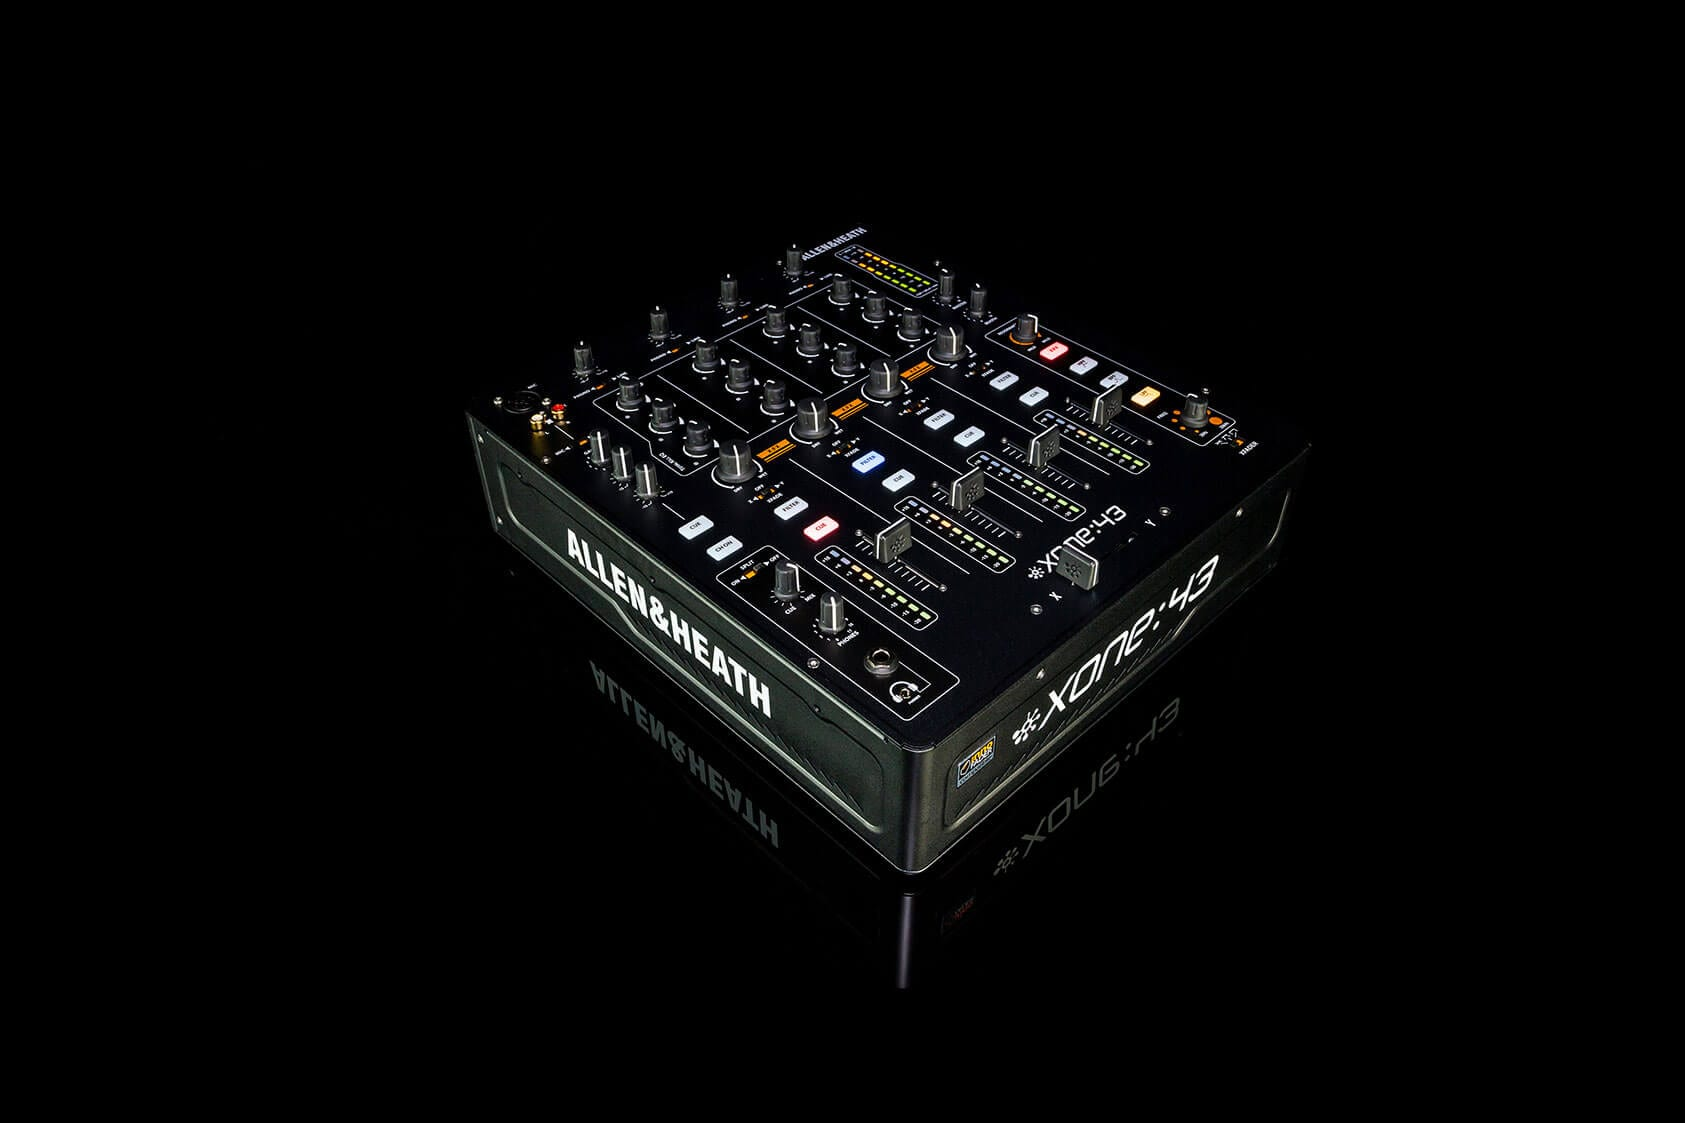 allen and heath xone 43 4 1 channel analogue dj mixer hytek electronics. Black Bedroom Furniture Sets. Home Design Ideas